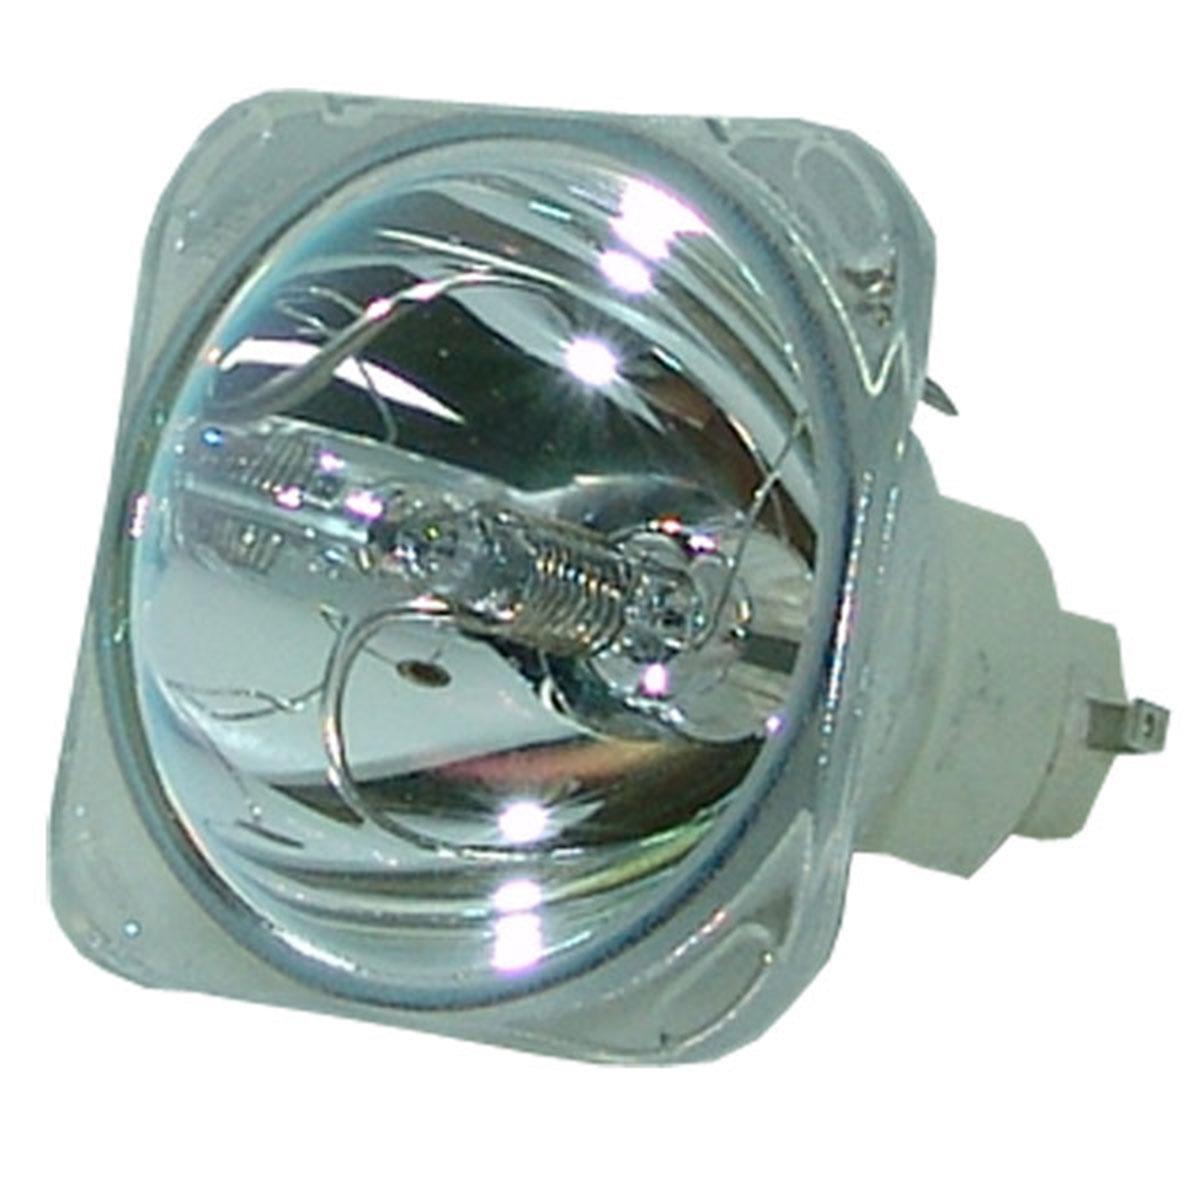 Original Osram Projector Lamp Replacement with Housing for BenQ 5J.J9V05.001 - image 5 de 5